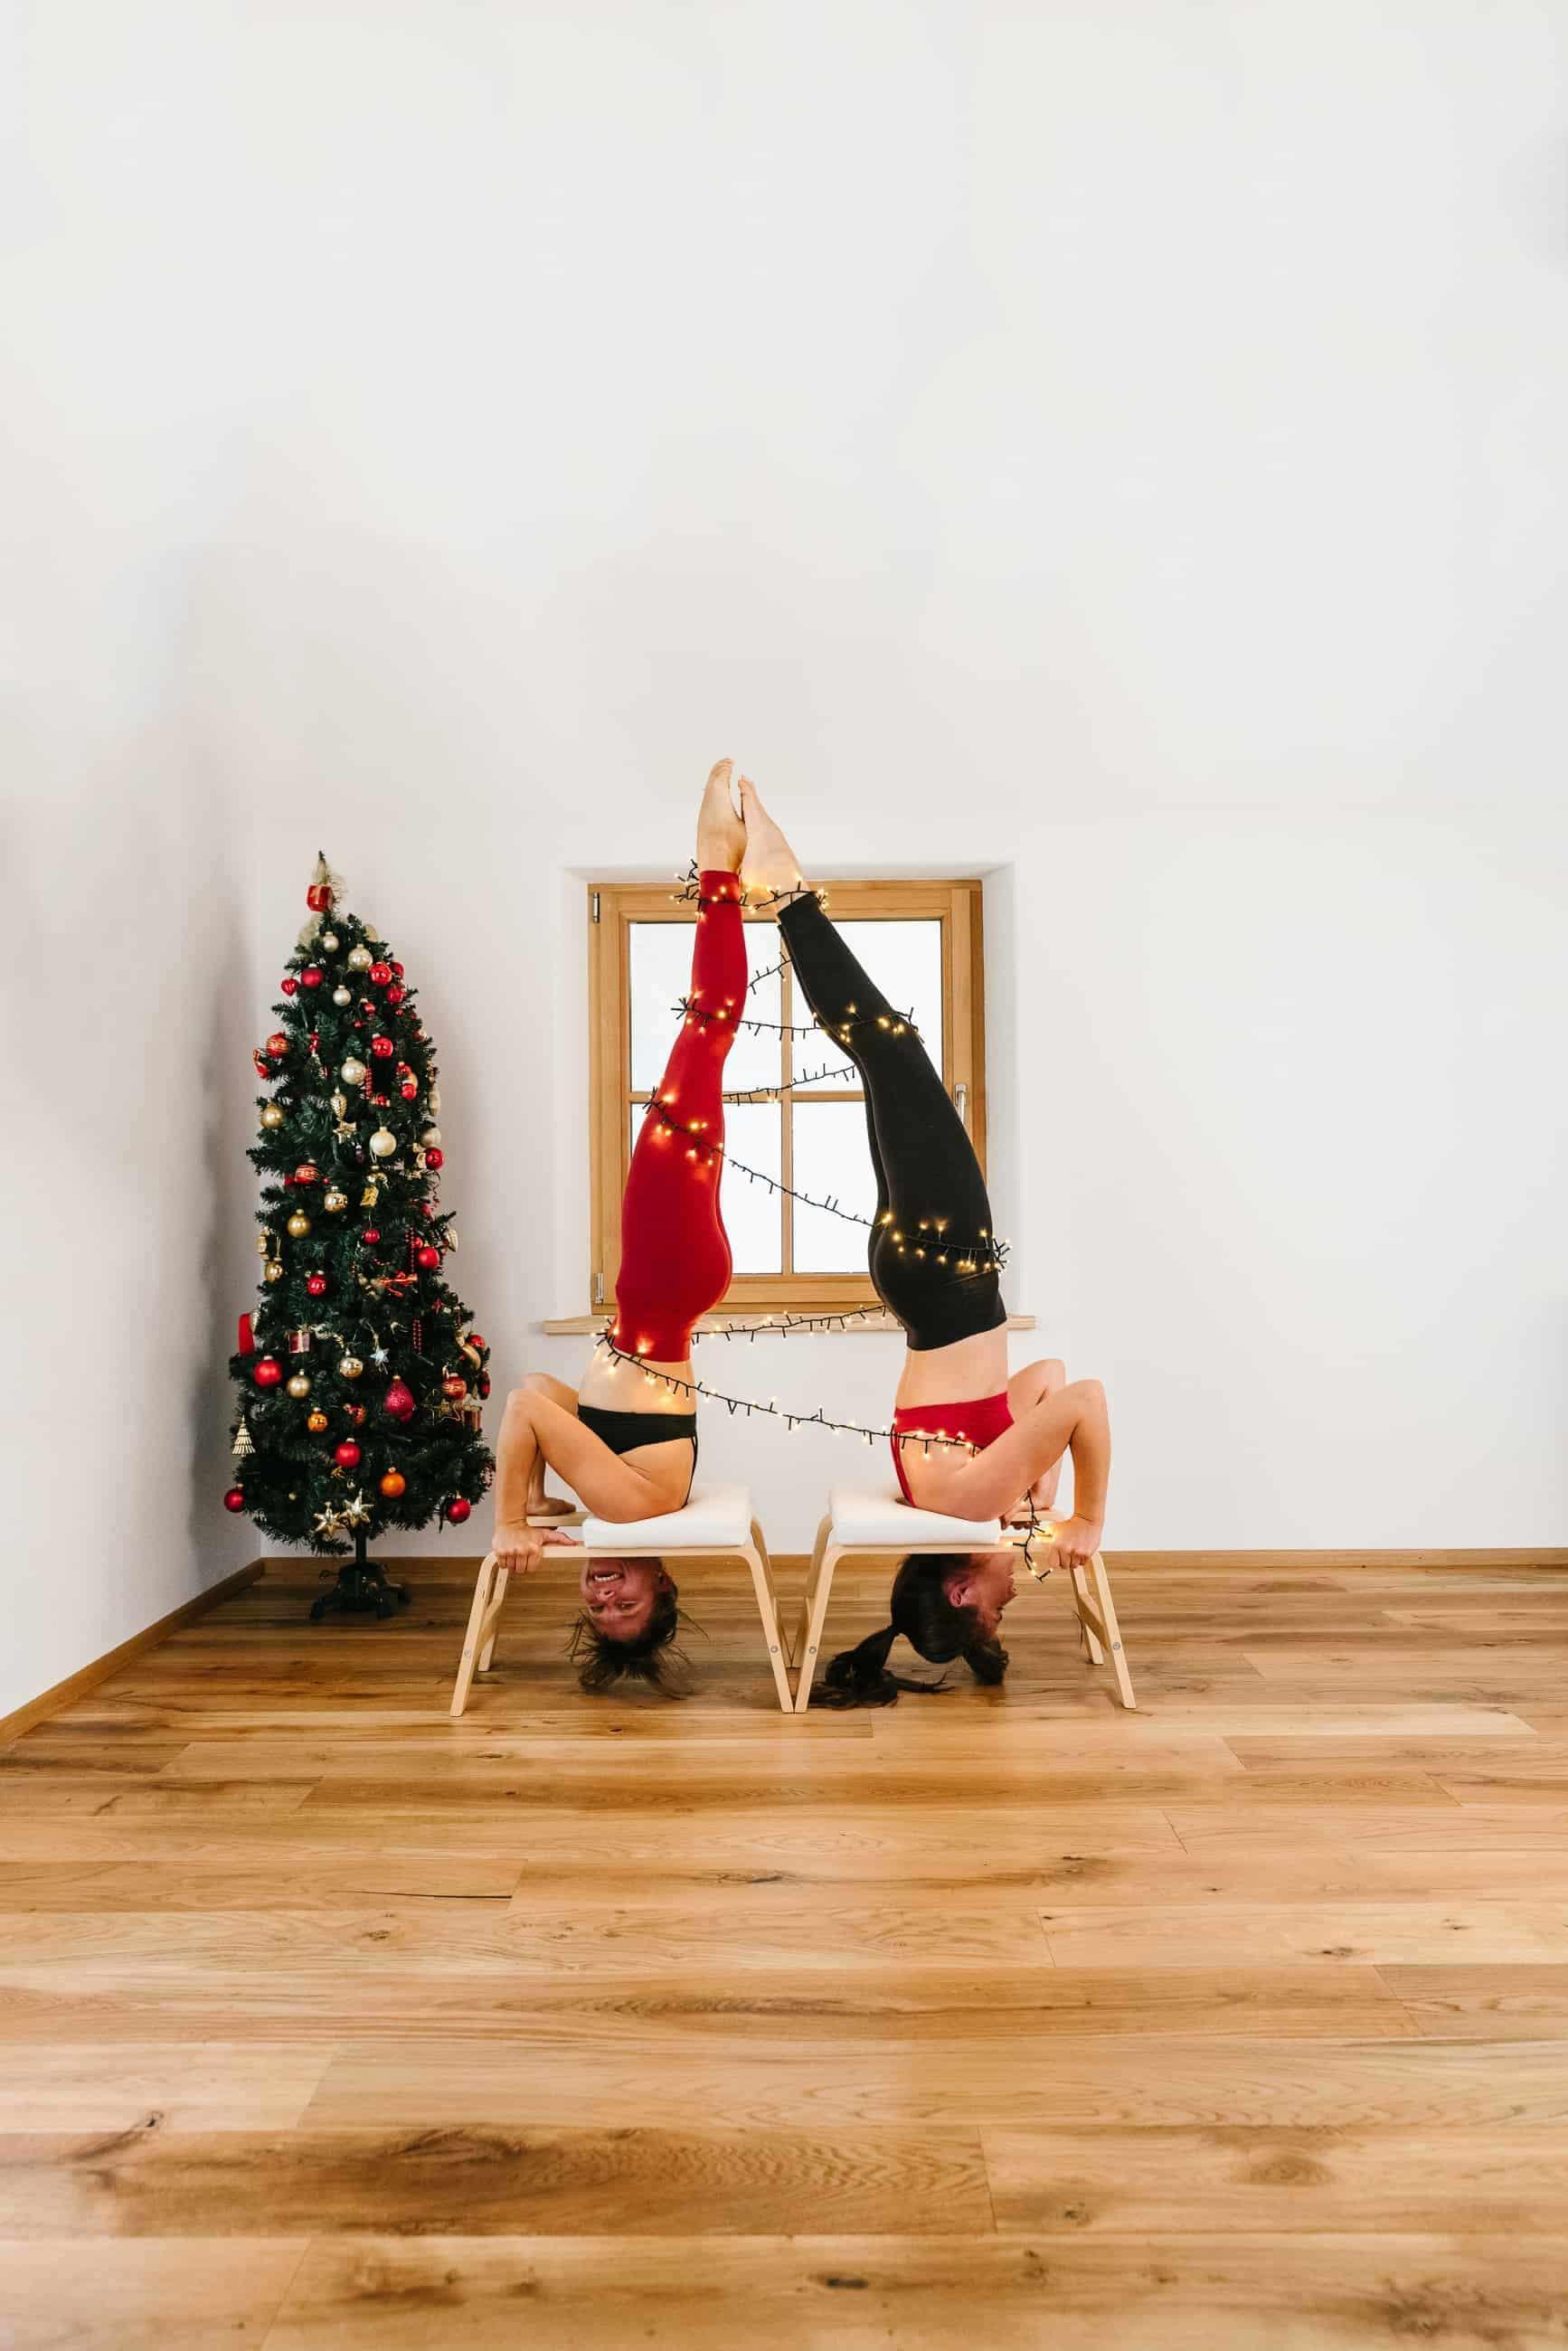 feetup-kopfstandhocker-sunita_ehlers-lifestyle_blog-adventskalender